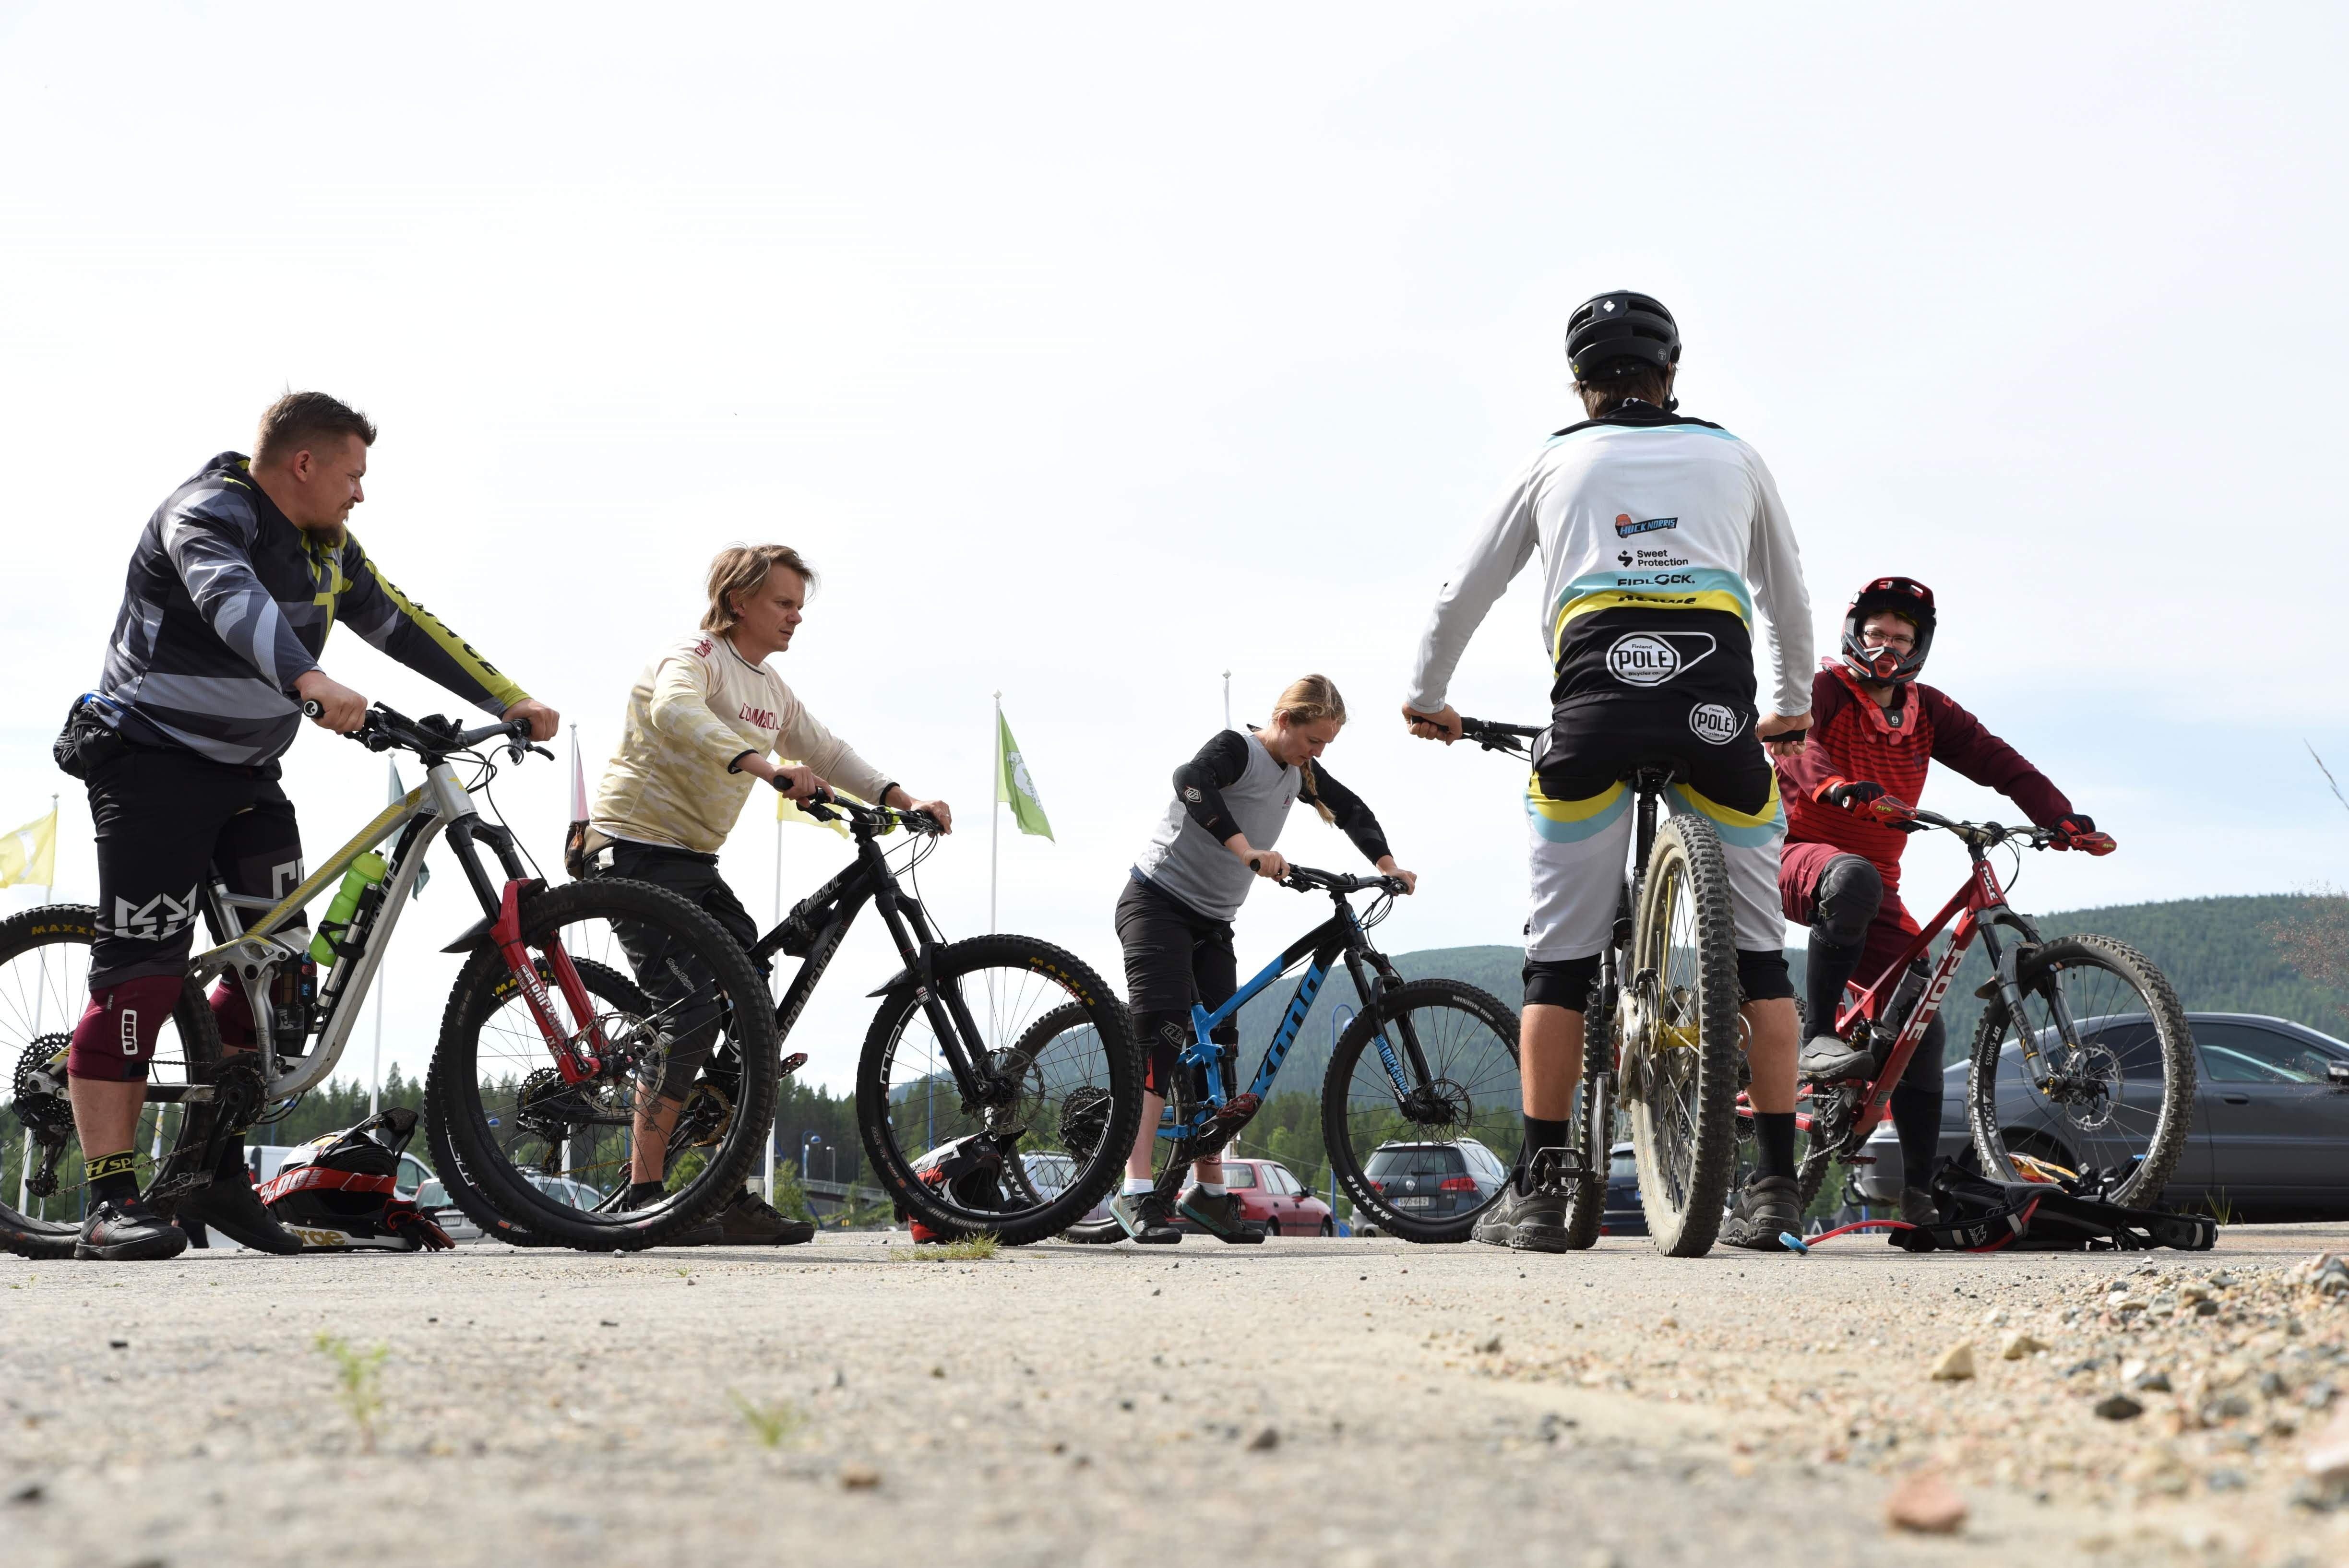 Levi Bike Park EXPRESS RUN